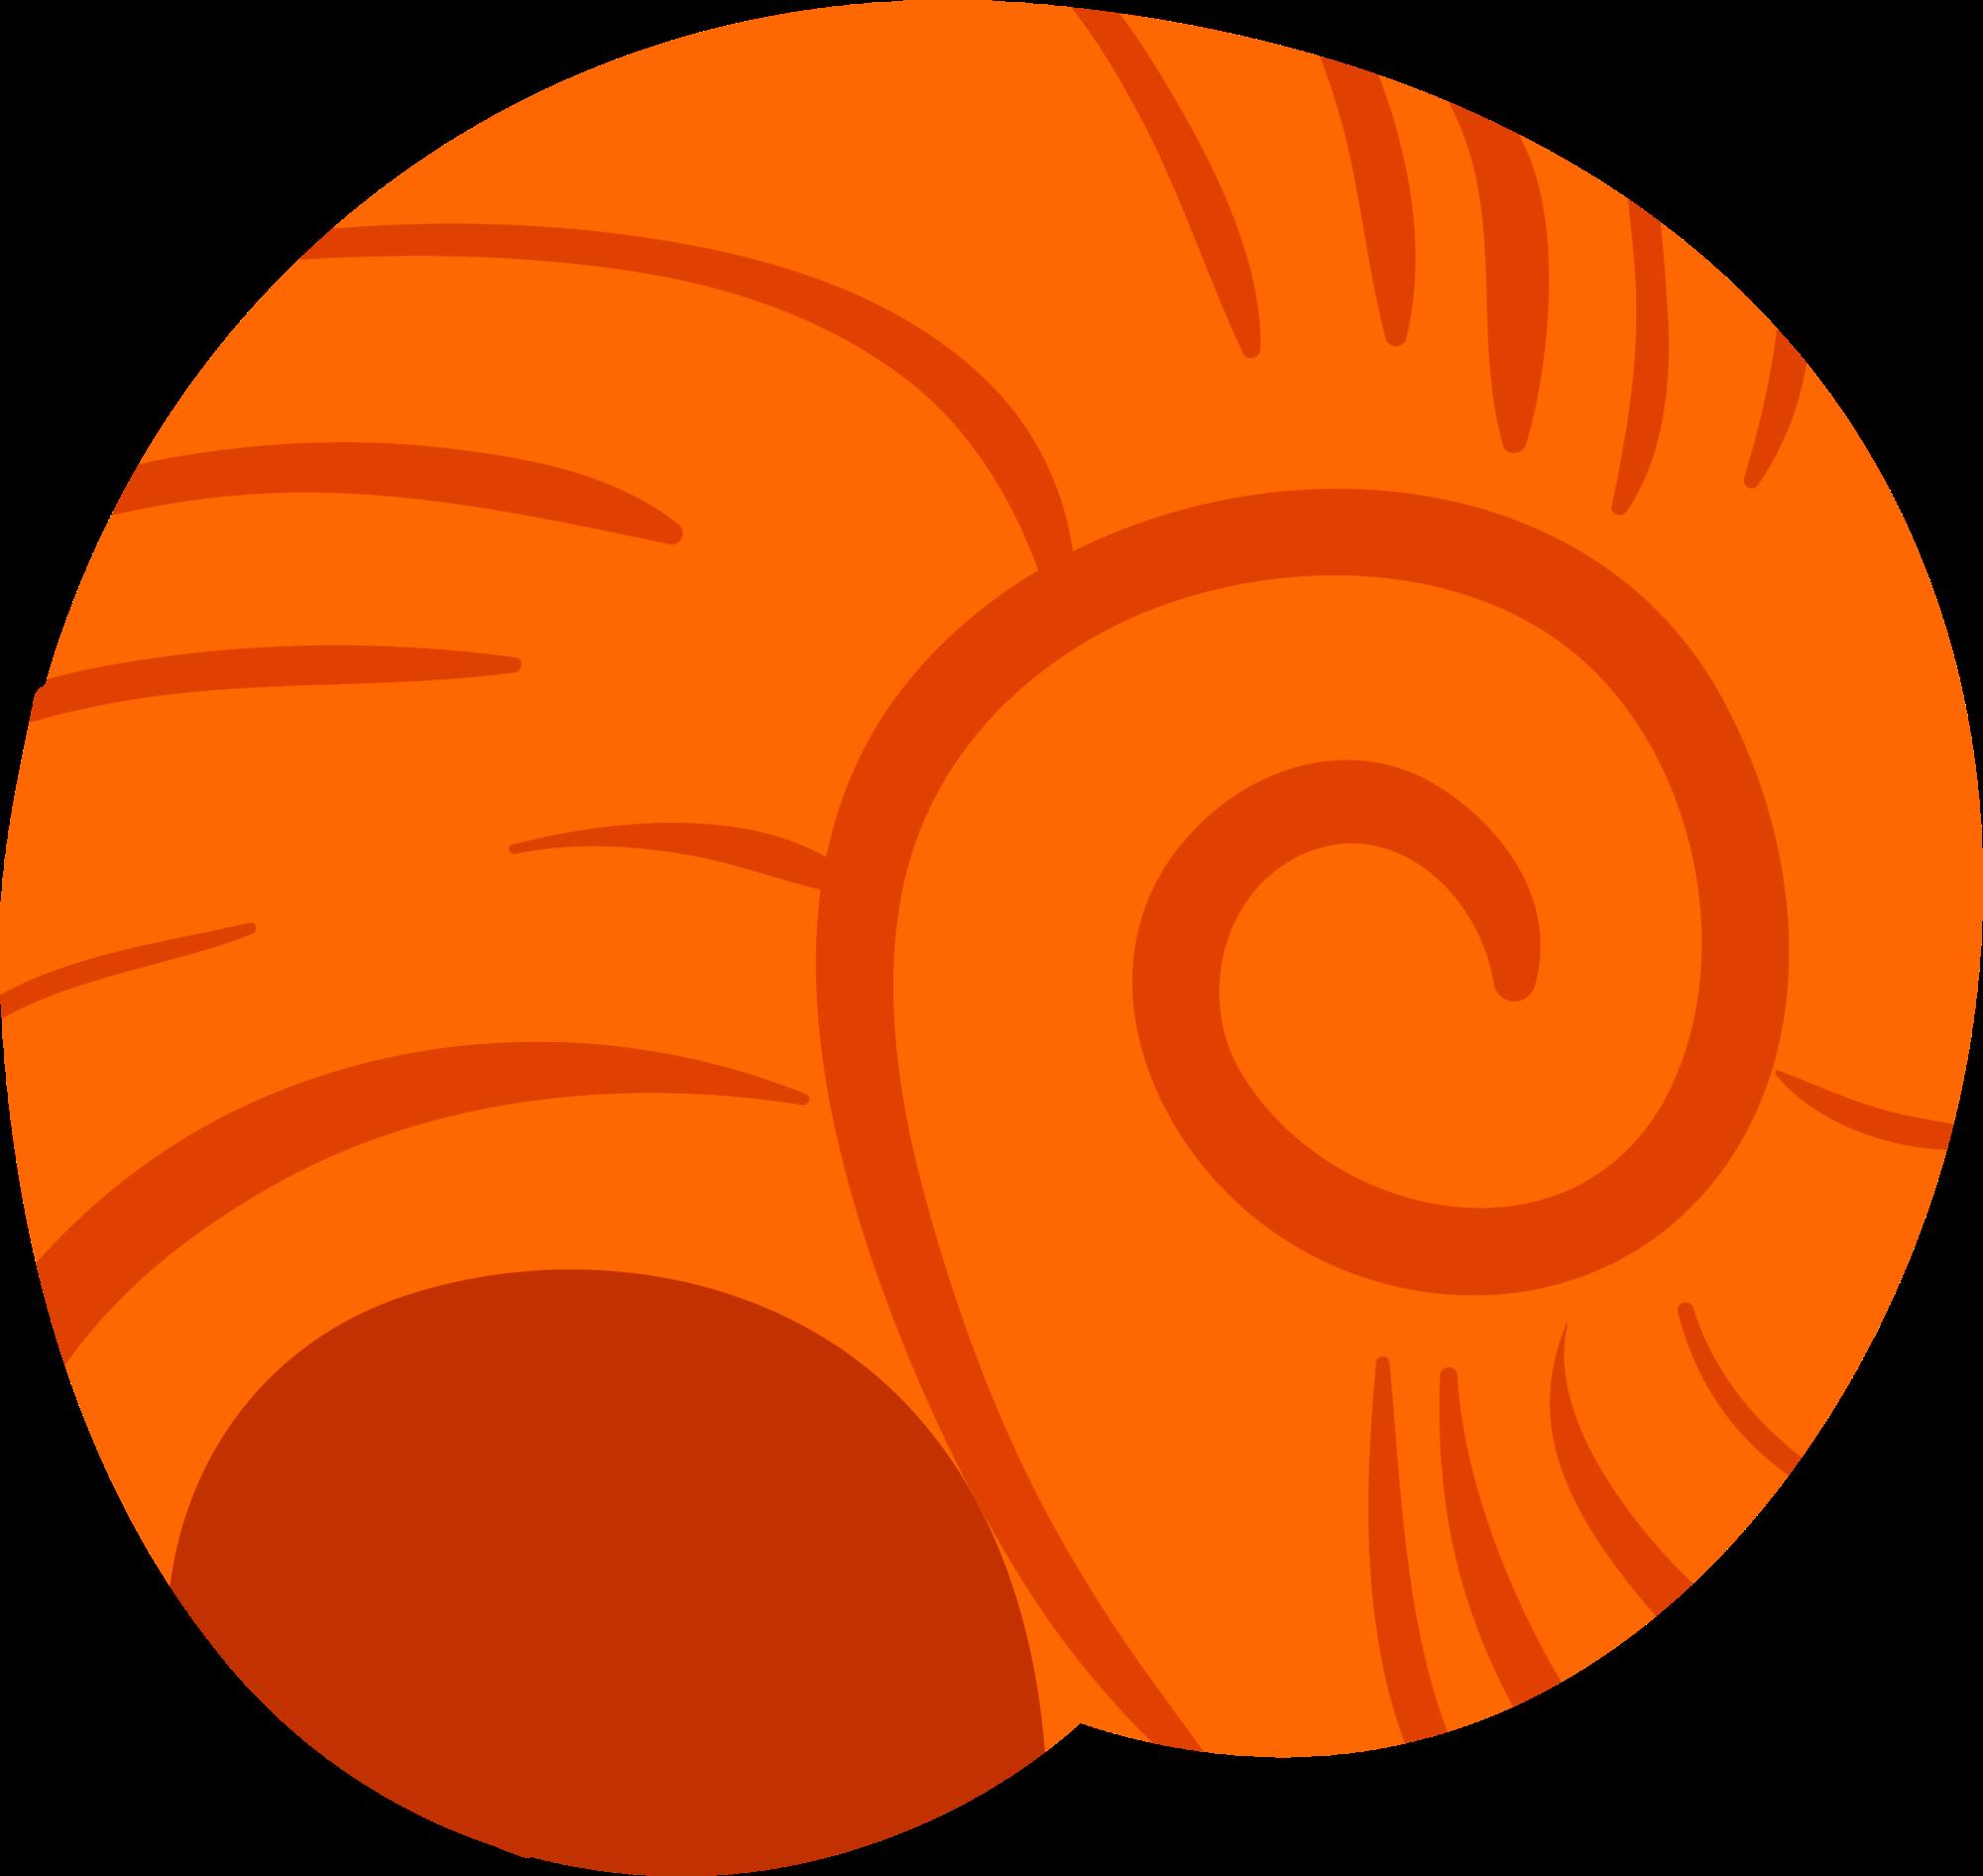 Gastropods cartoon snail orange. Shell clipart gastropod